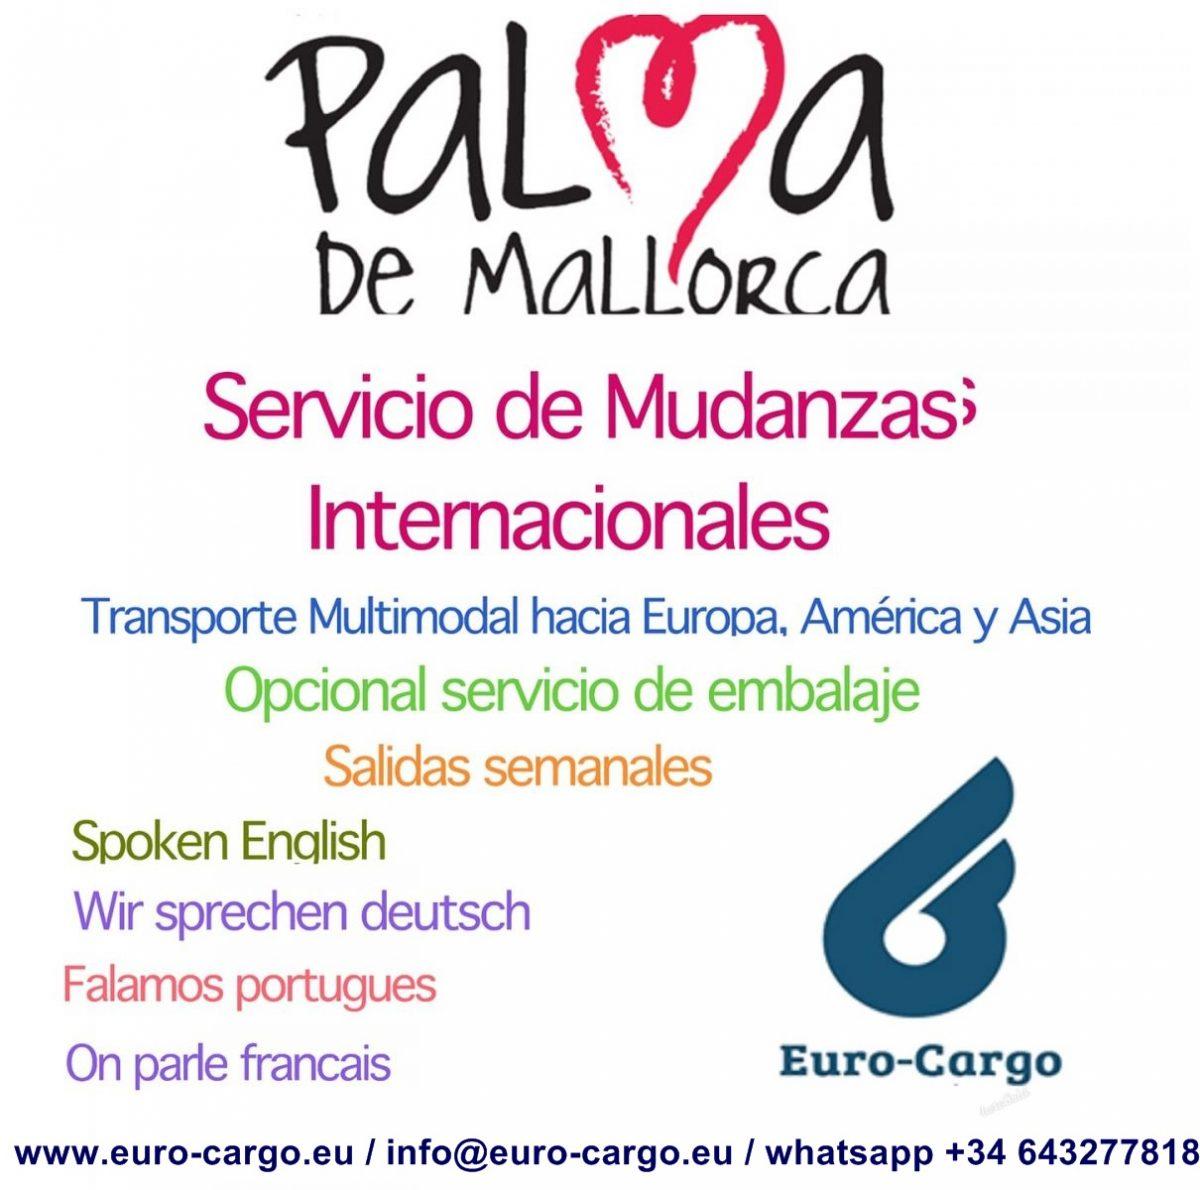 Mudanzas-Internacionales-Palma-de-Mallorca-2-1200x1200-1200x1190.jpg